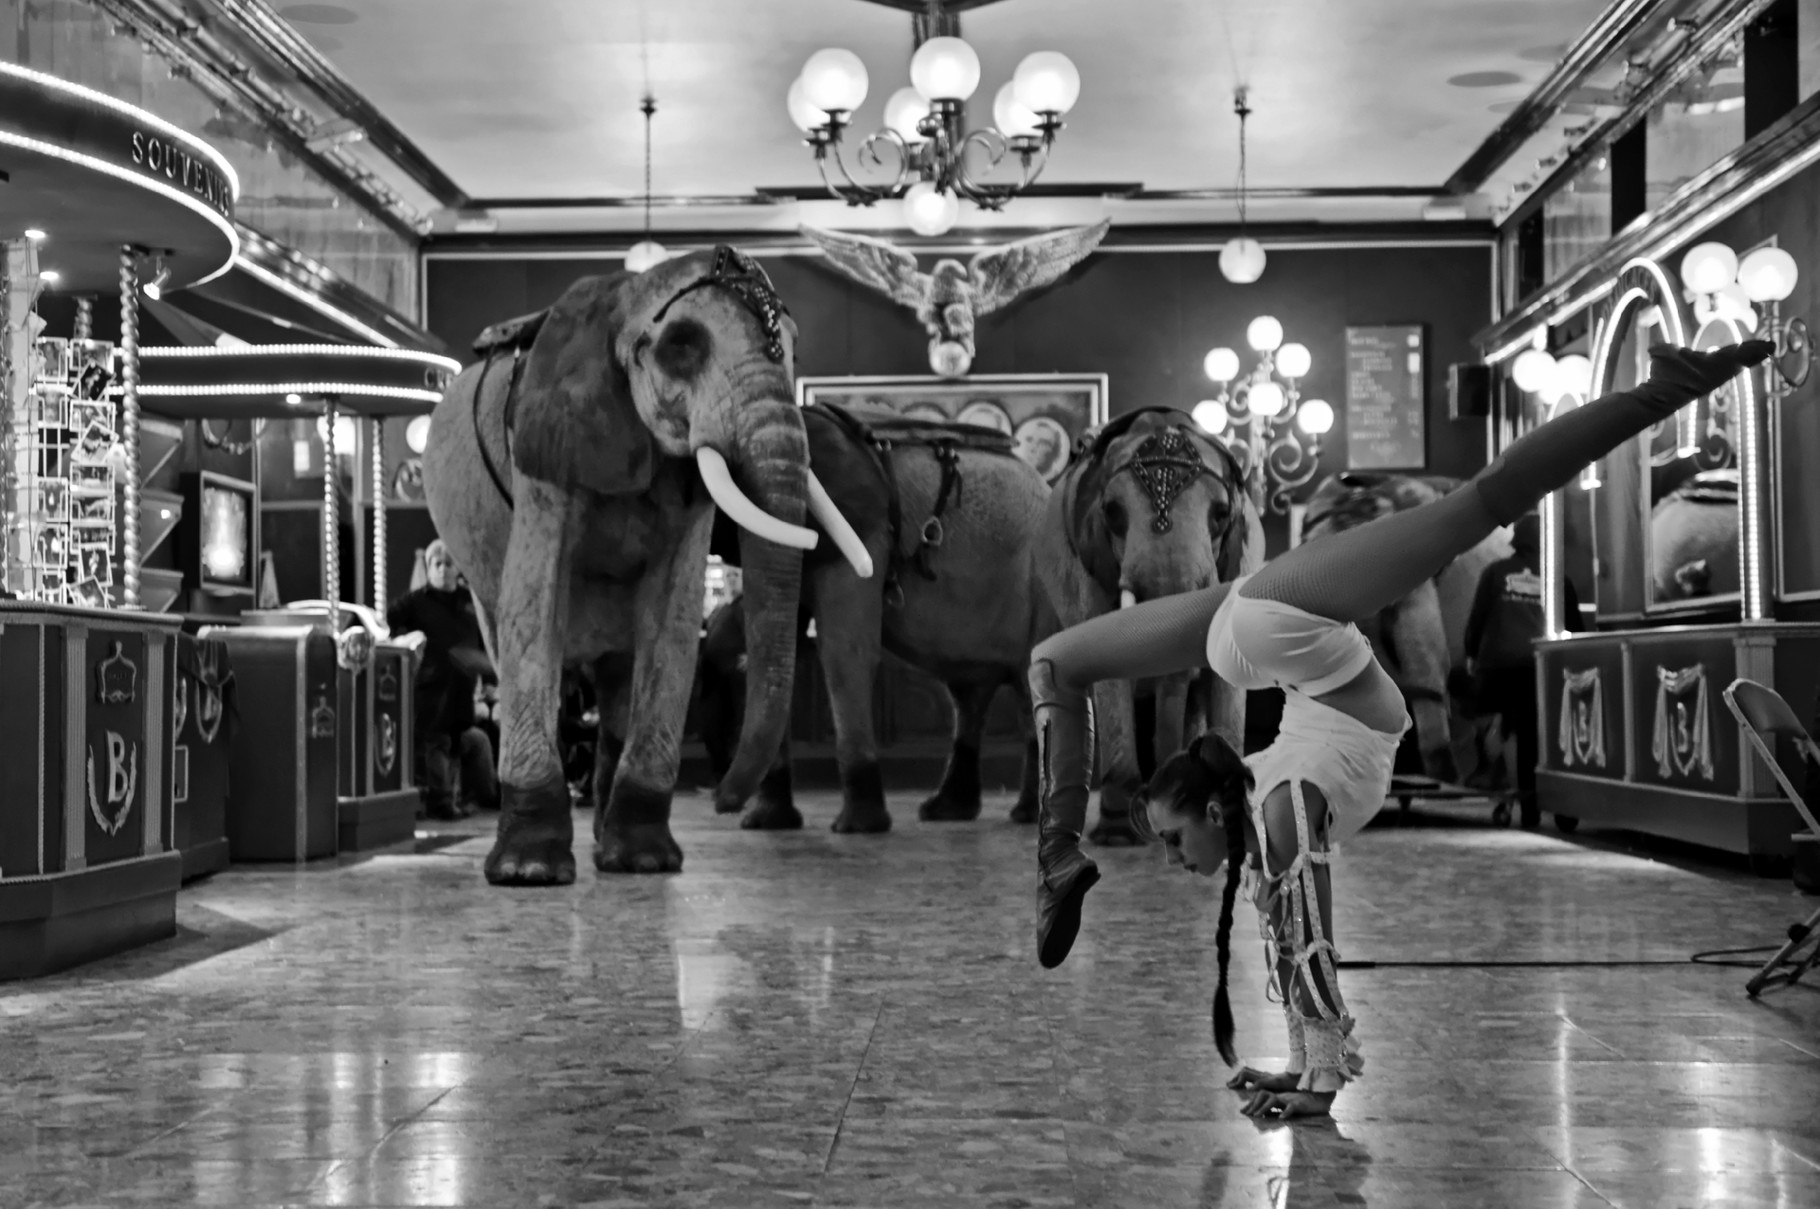 L'Acrobate et l'Elephant, 2014. 60 x 90 cm, ed. 8 I 80 x 120 cm, ed. 6